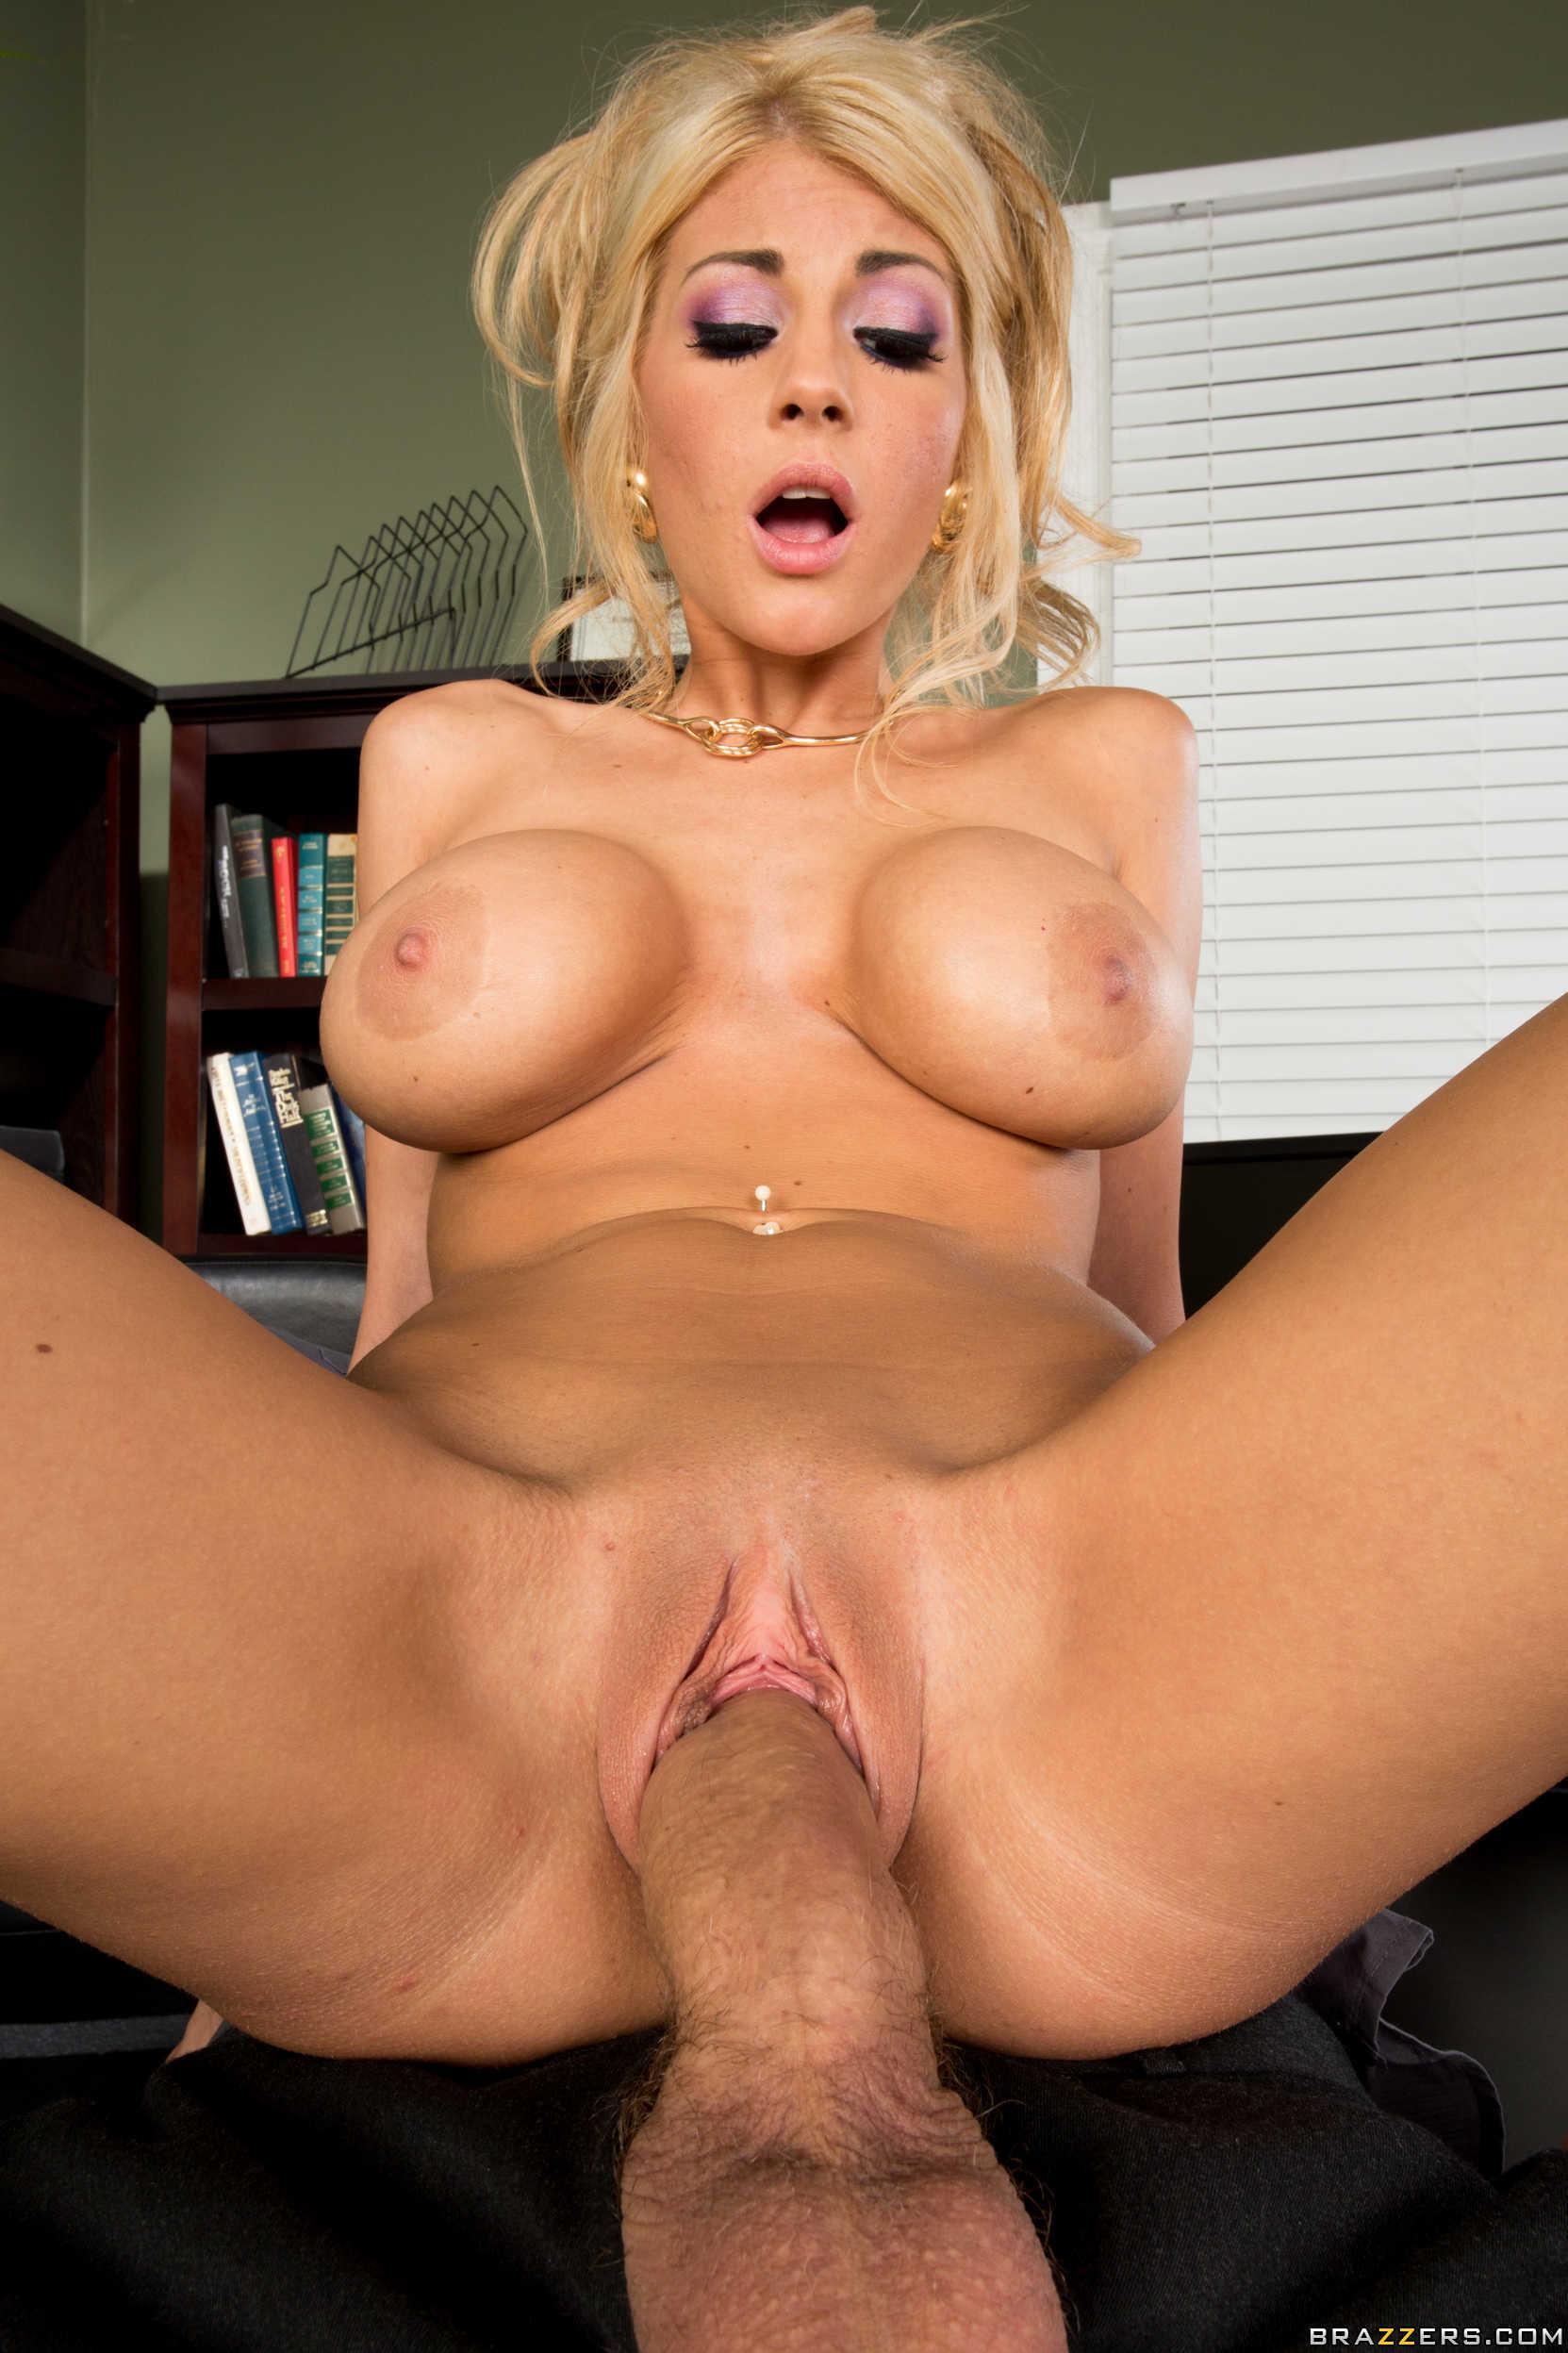 Blonde Pornstar Fuck